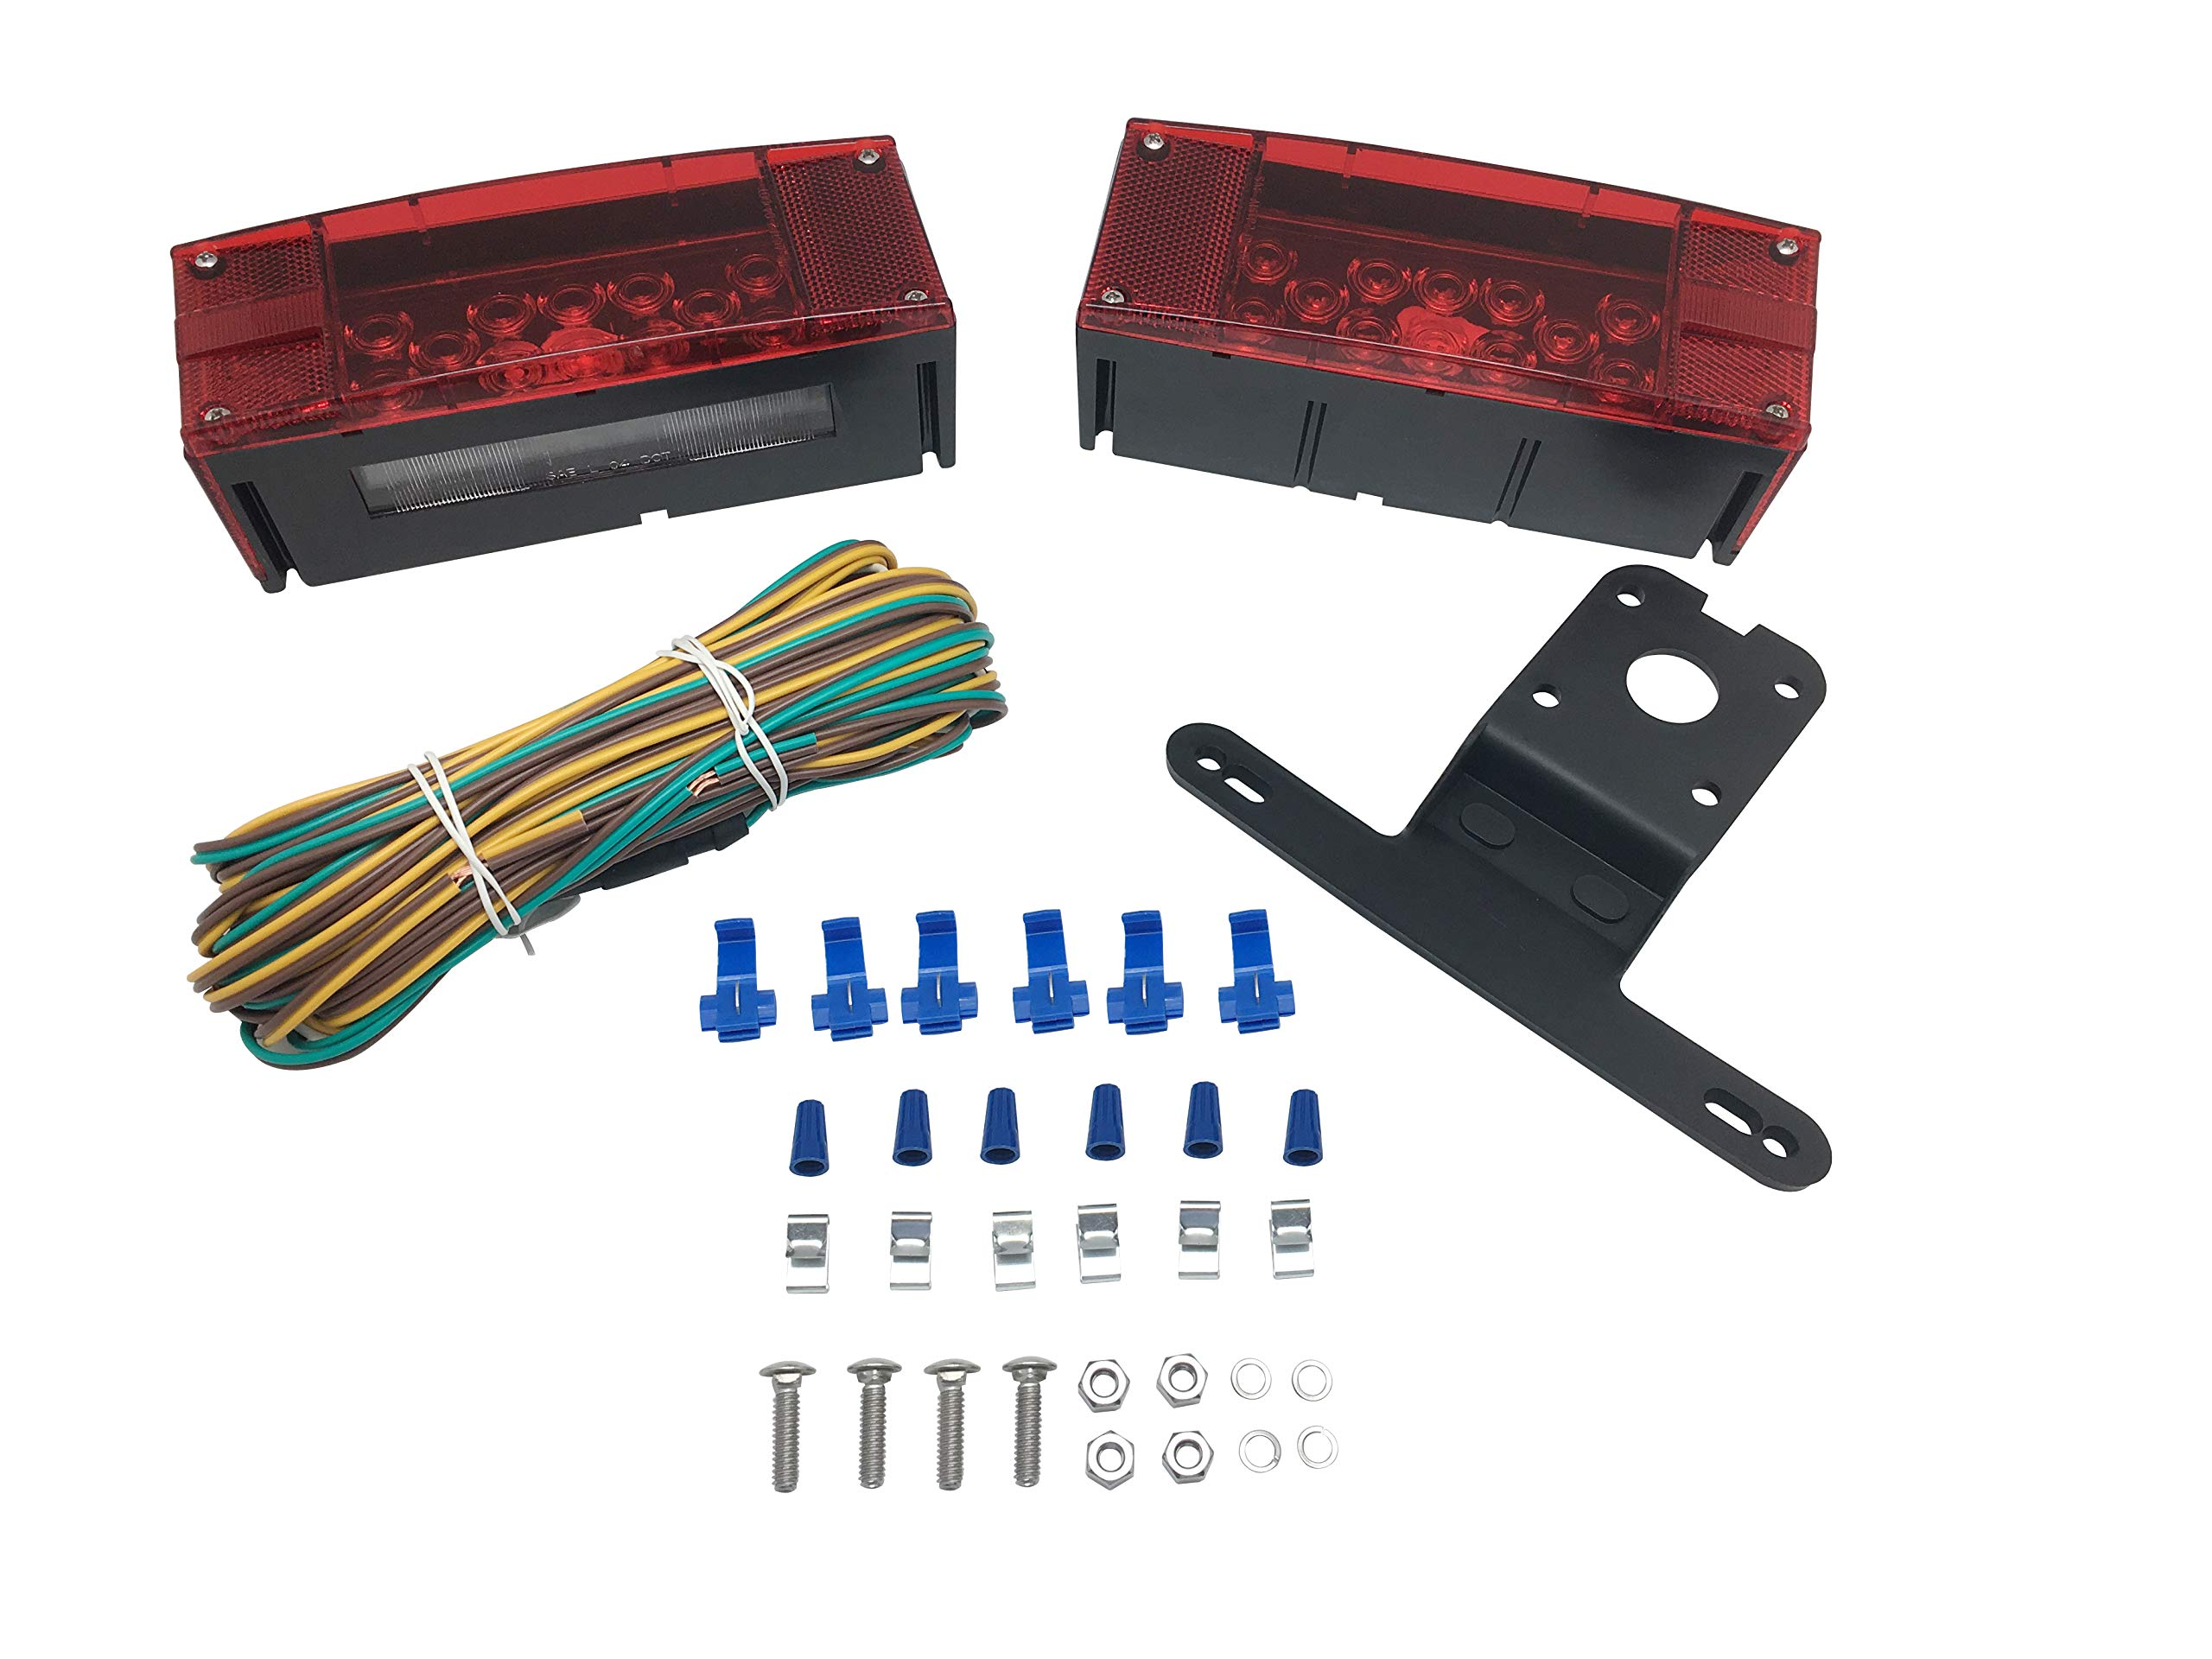 MaxxHaul 70468 12V LED Low Profile Submersible Rectangular Trailer Light Kit by MaxxHaul